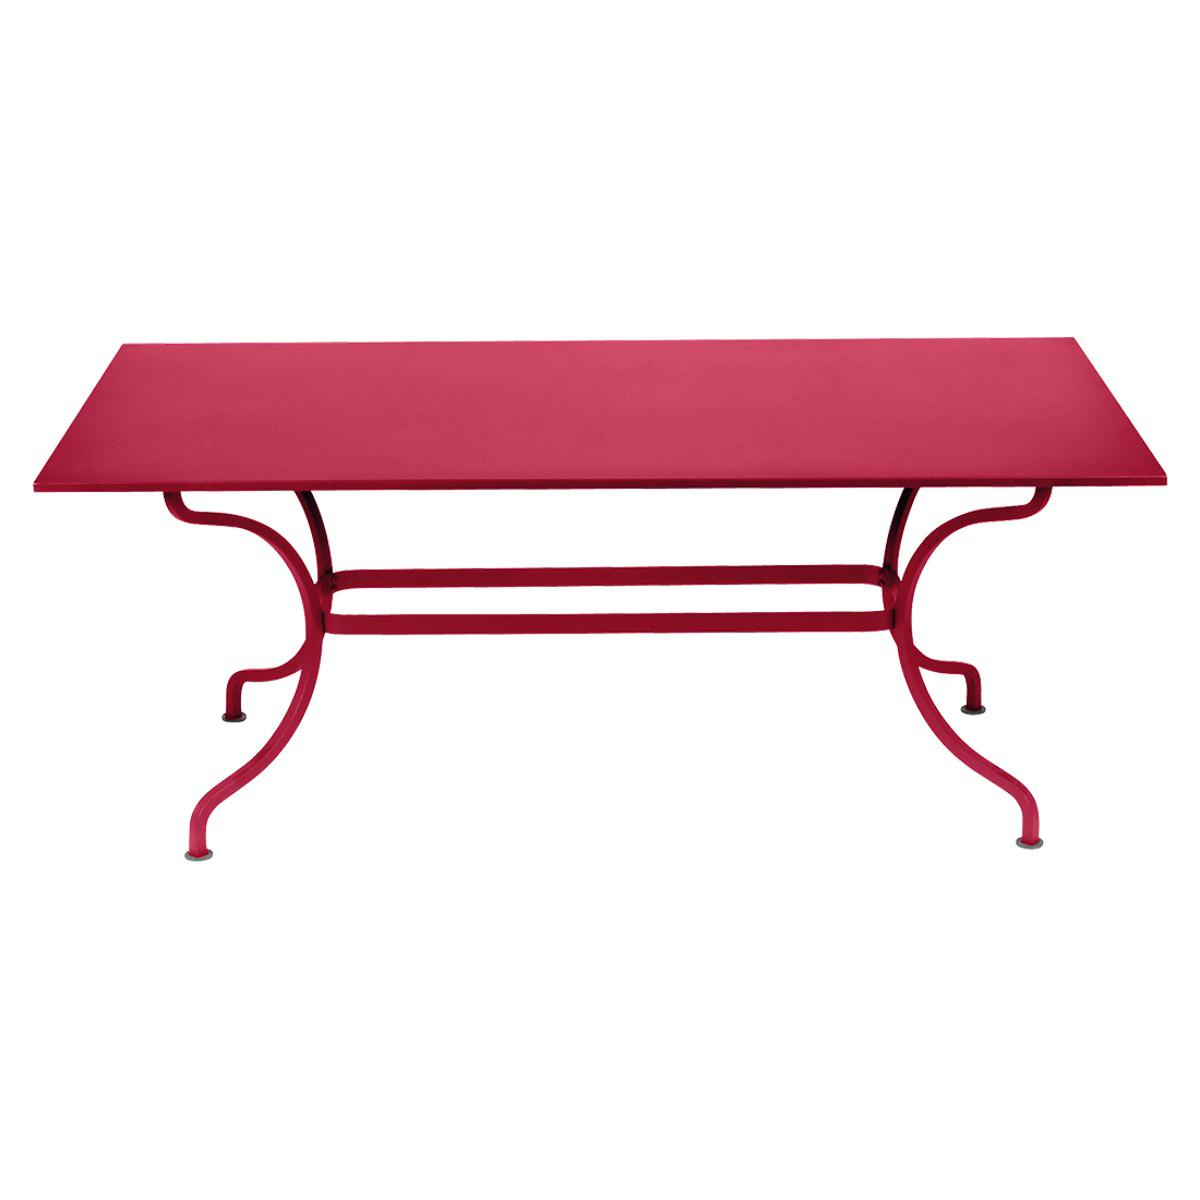 Table 180x100cm ROMANE Fermob rose praline